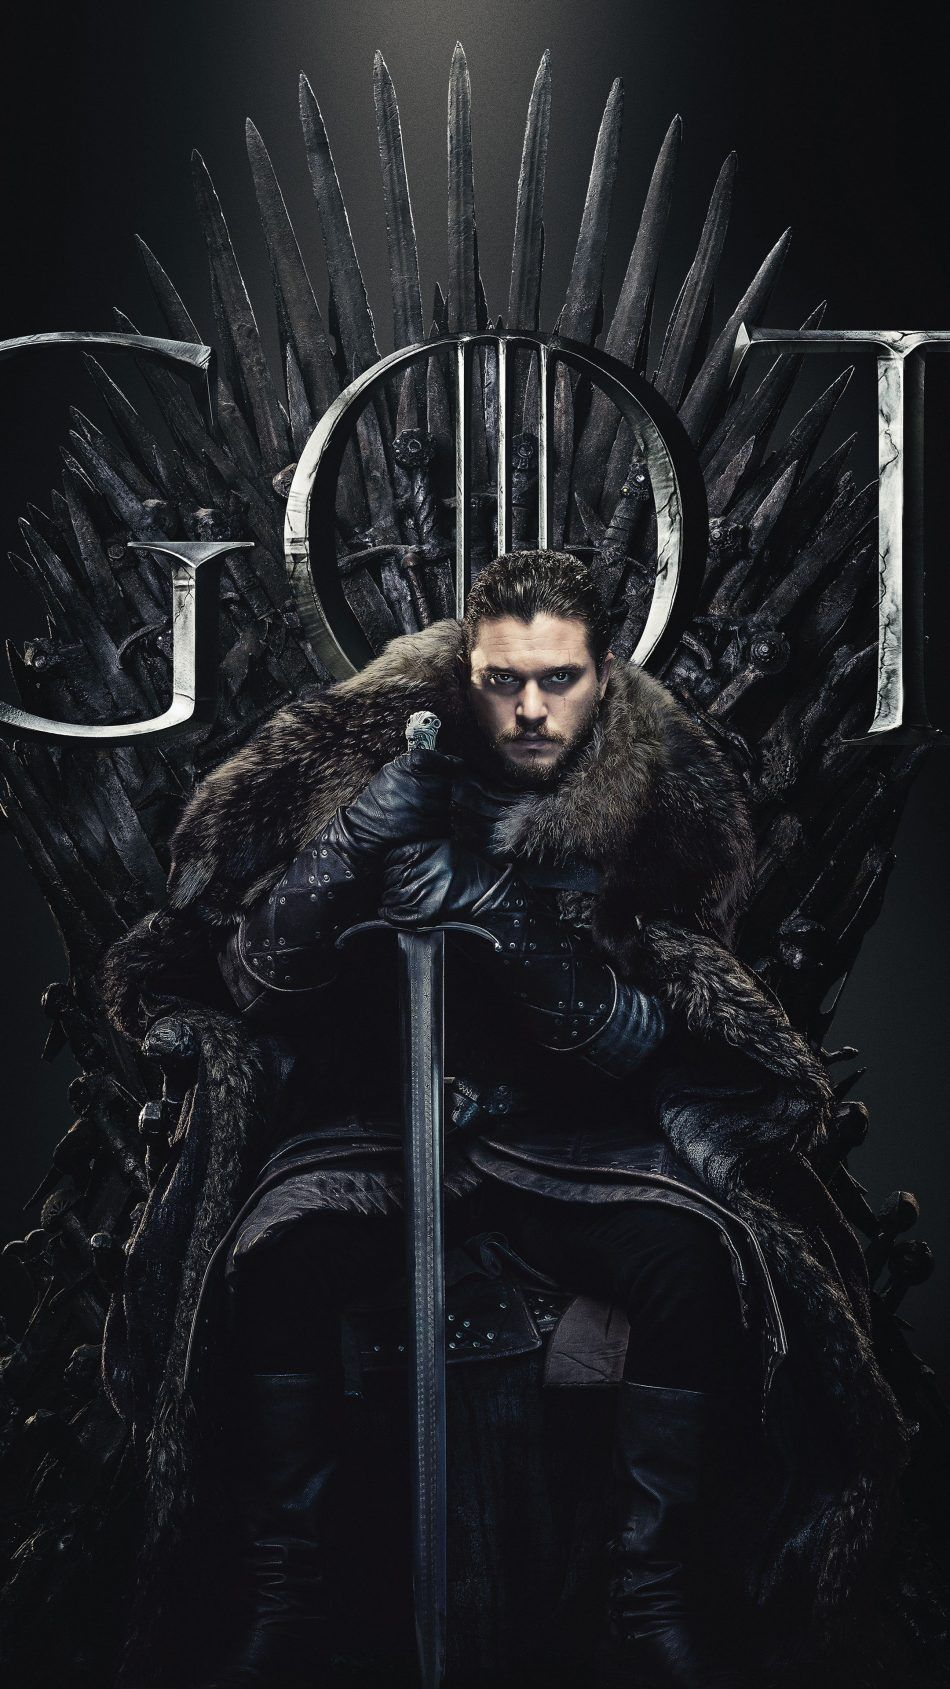 Jon Snow Game Of Thrones Season 8 Game Of Thrones Poster Jon